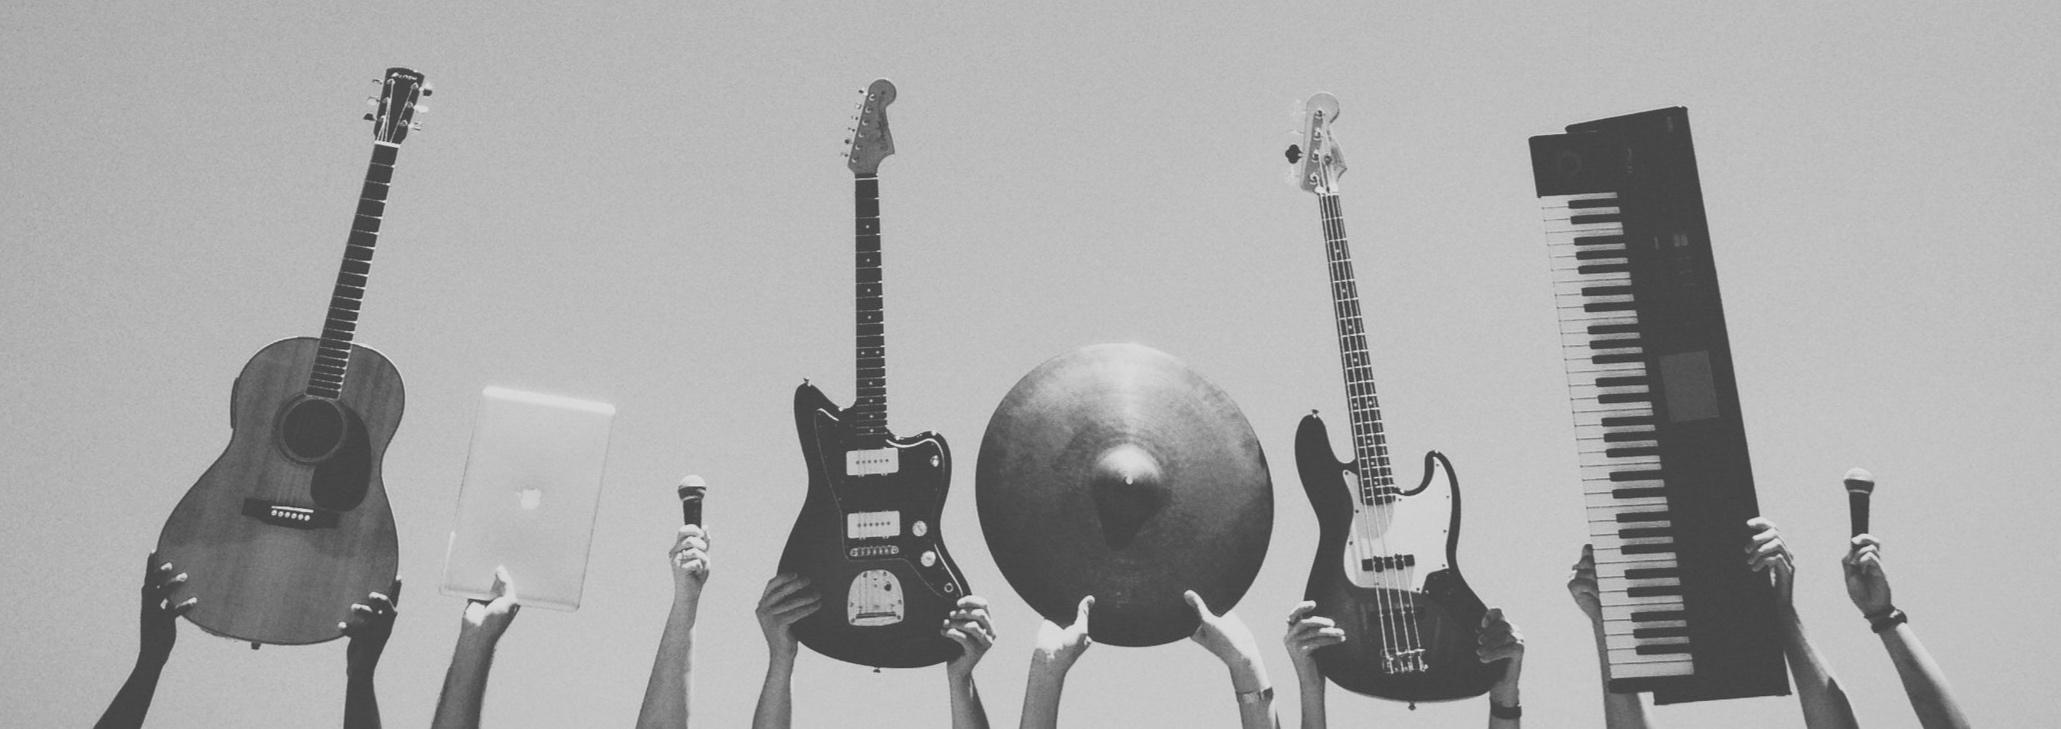 audio-black-and-white-black-and-white-6966.jpg